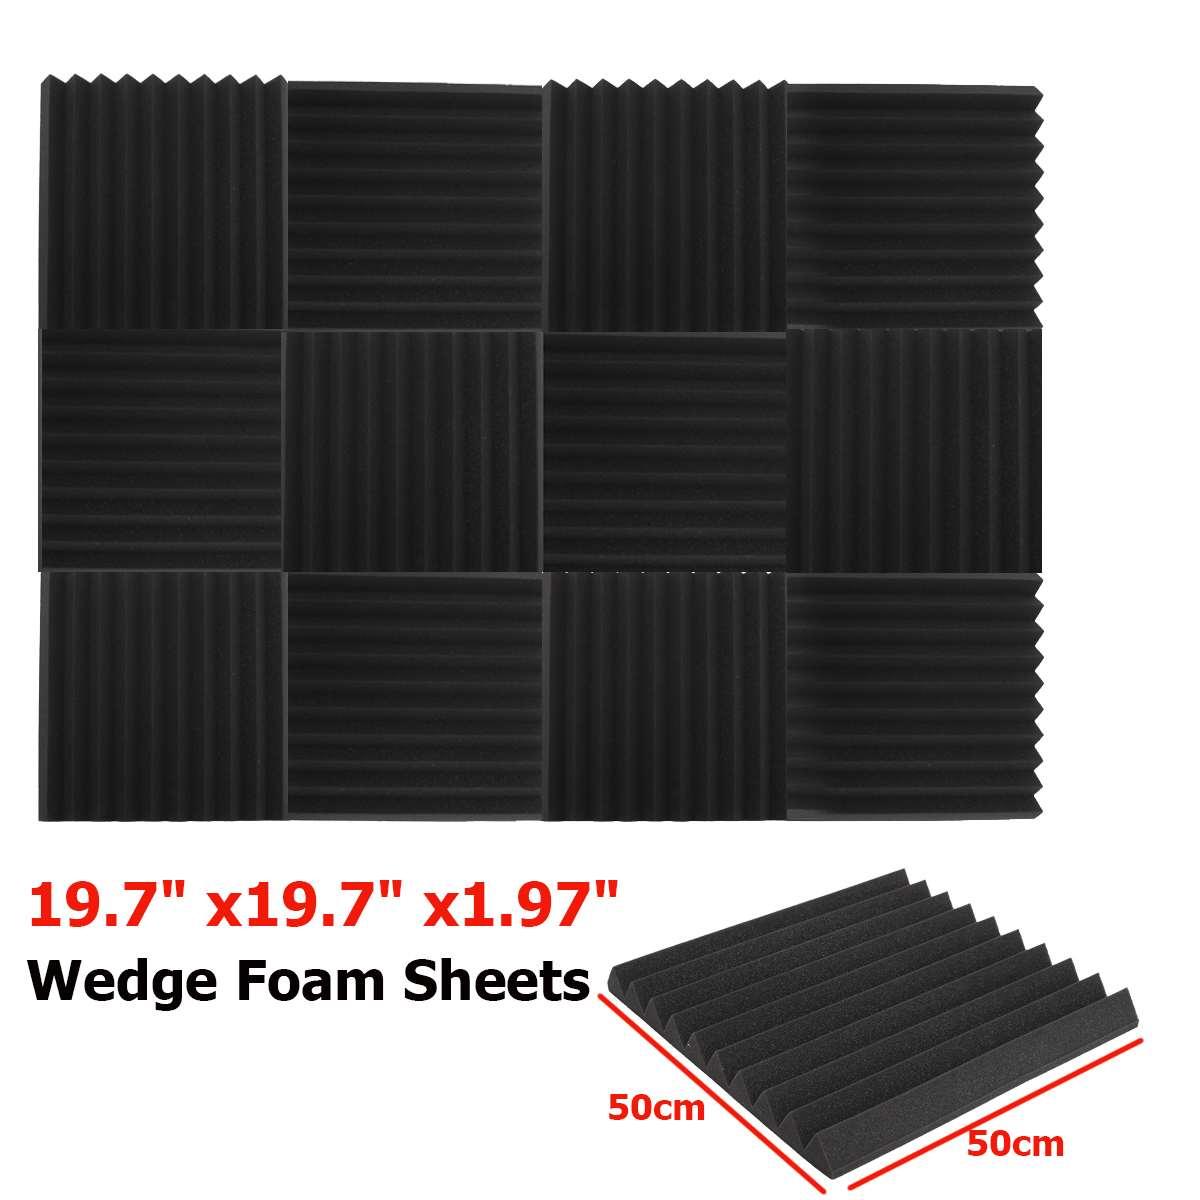 1PC Acoustic Wedge Studio Soundproofing Foam Wall Tiles 50 x 50 x 5 cm Black1PC Acoustic Wedge Studio Soundproofing Foam Wall Tiles 50 x 50 x 5 cm Black